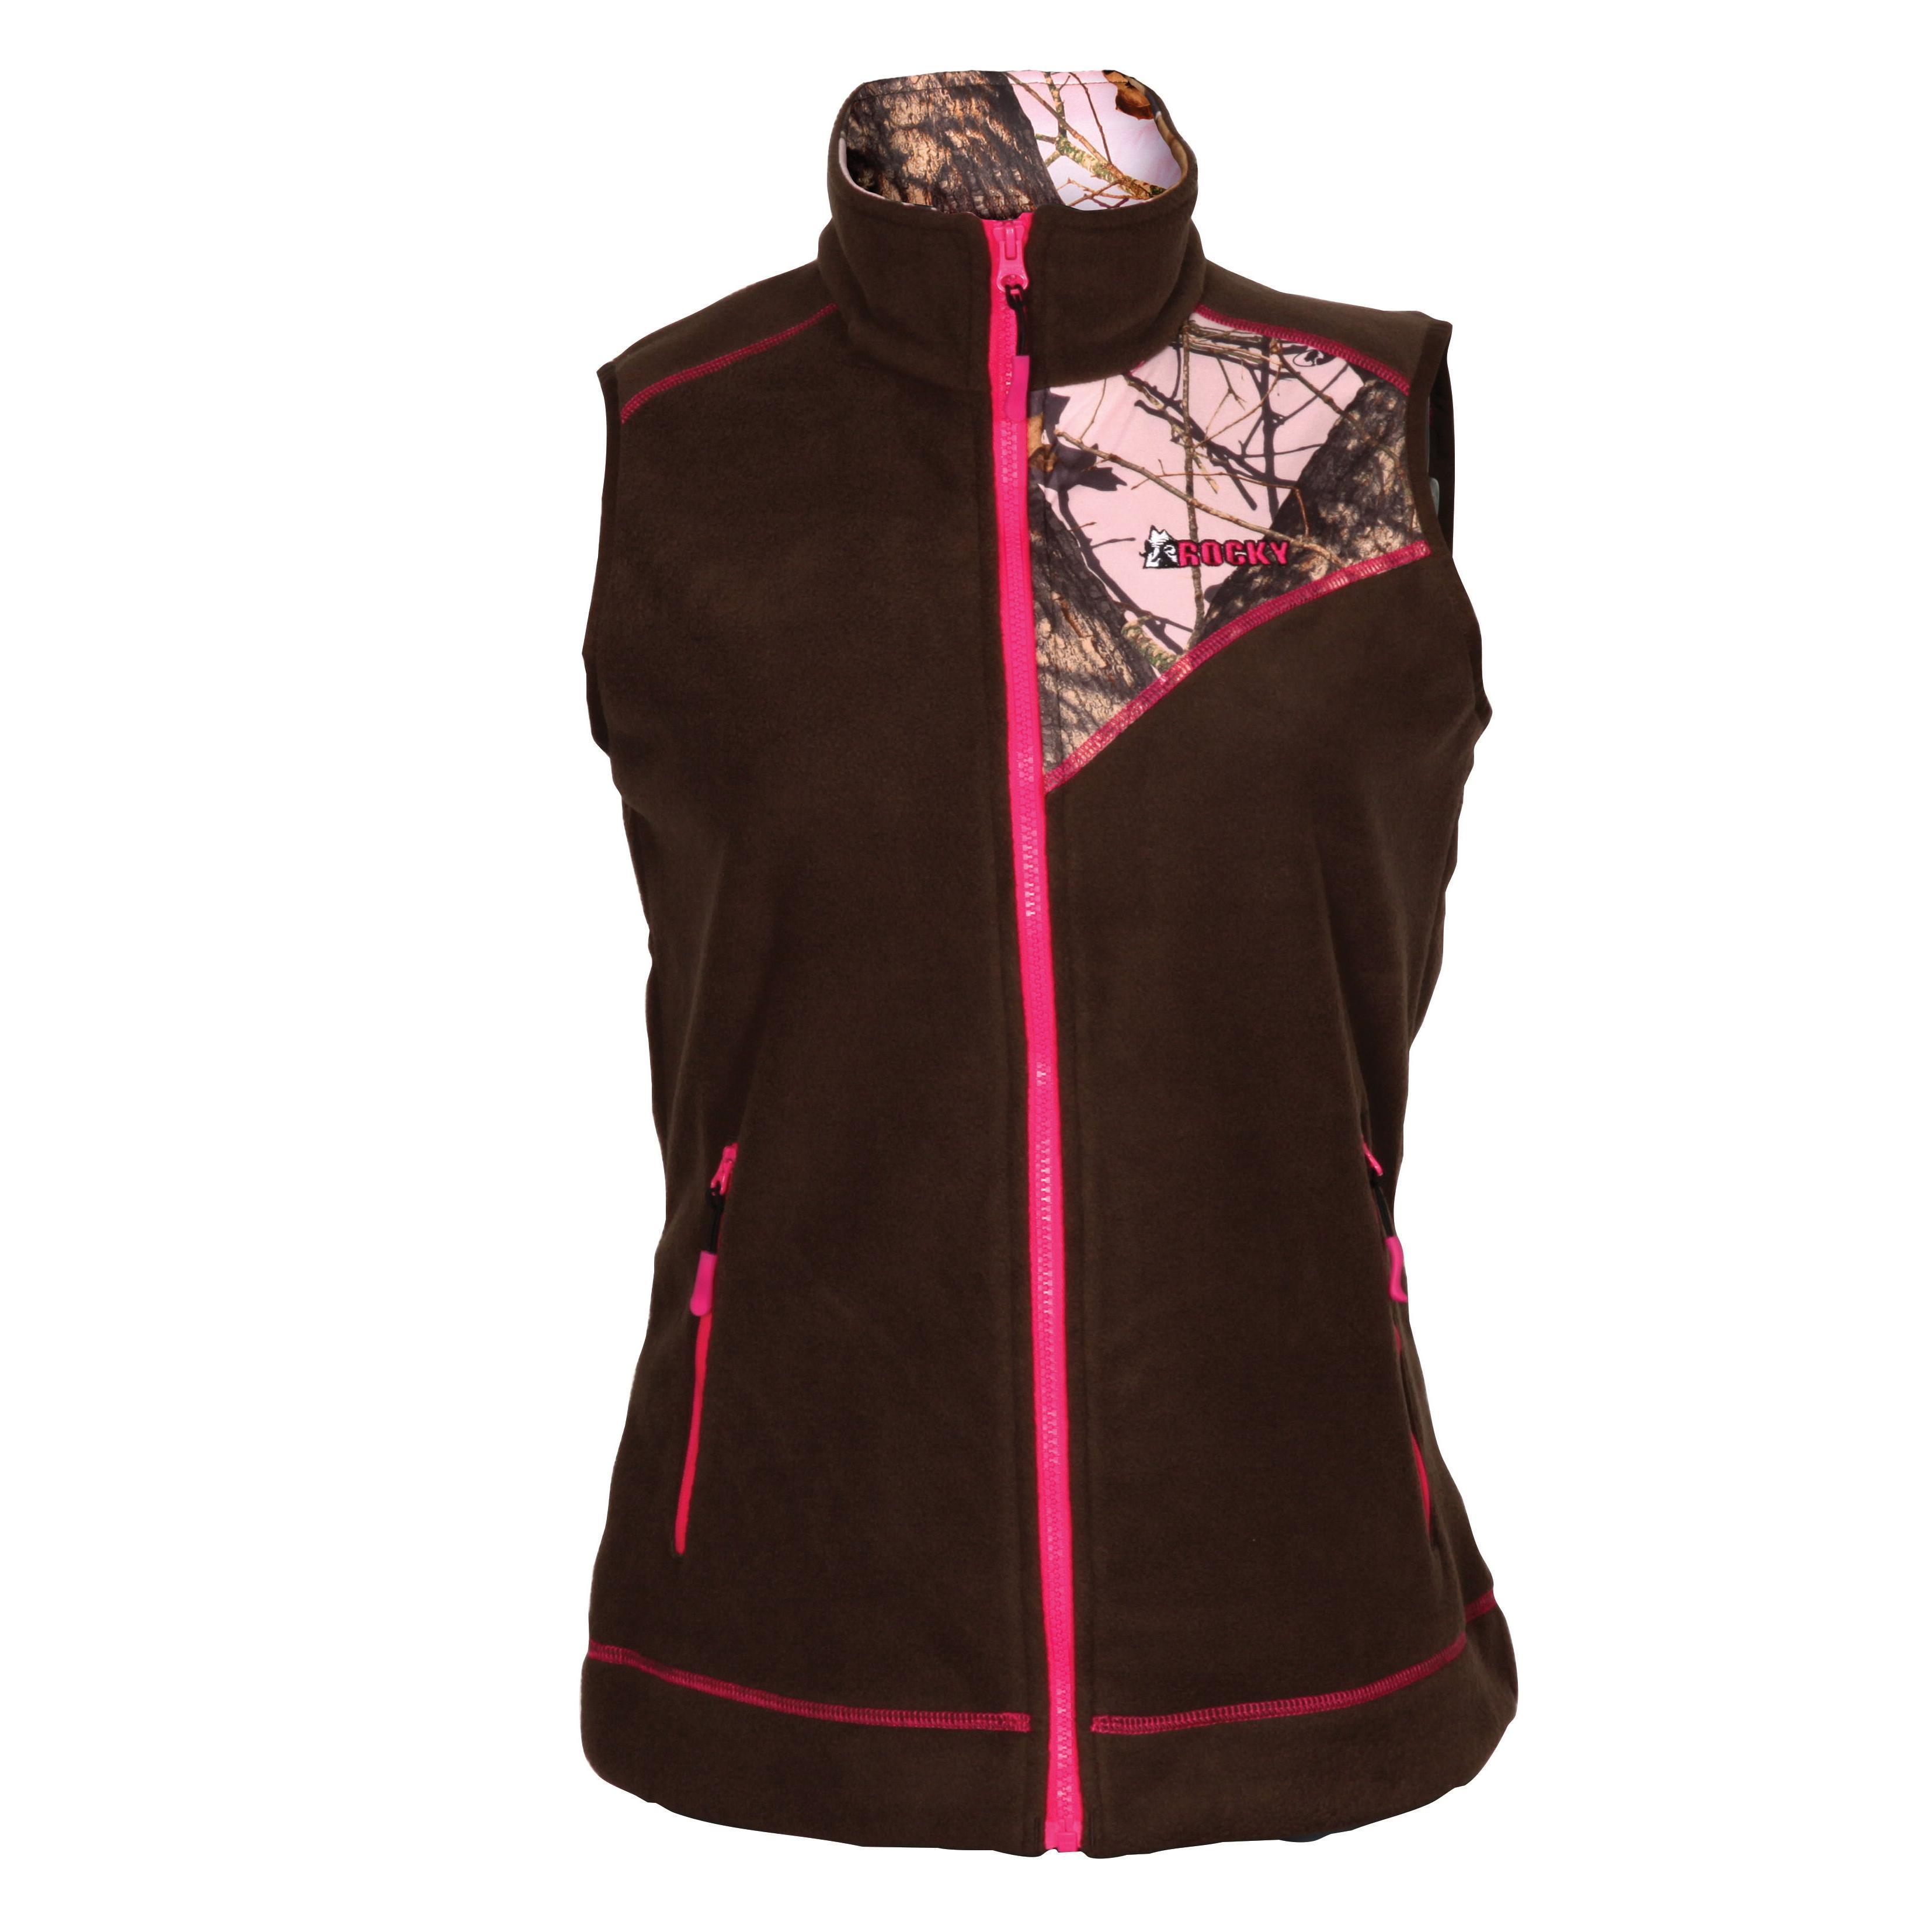 ffd31d7dffce7 Rocky Women's Full Zip Fleece VestRocky Women's Full Zip Fleece Vest, Brown  MOPink